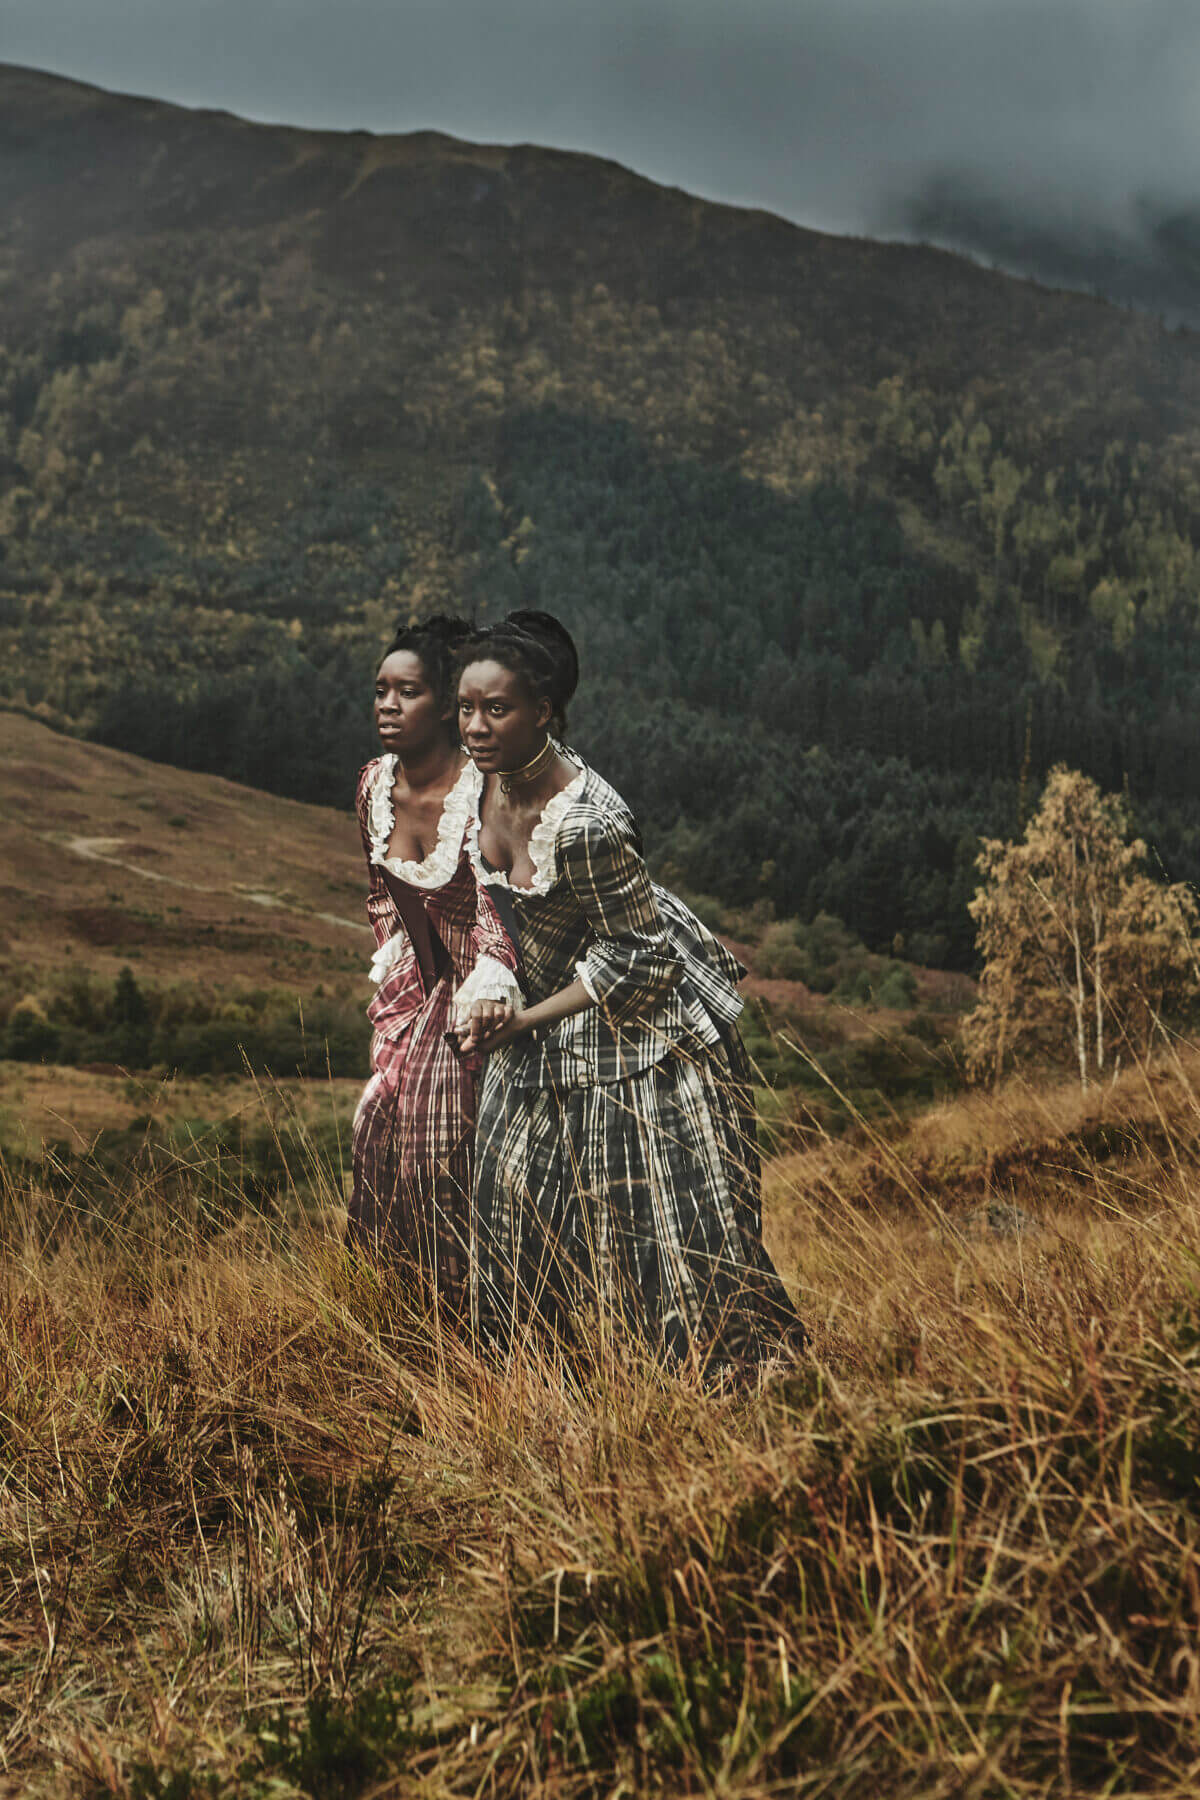 #Blackgirlmagic: Sisters Shine Light on Slavery  in Scotland with New Film 1745